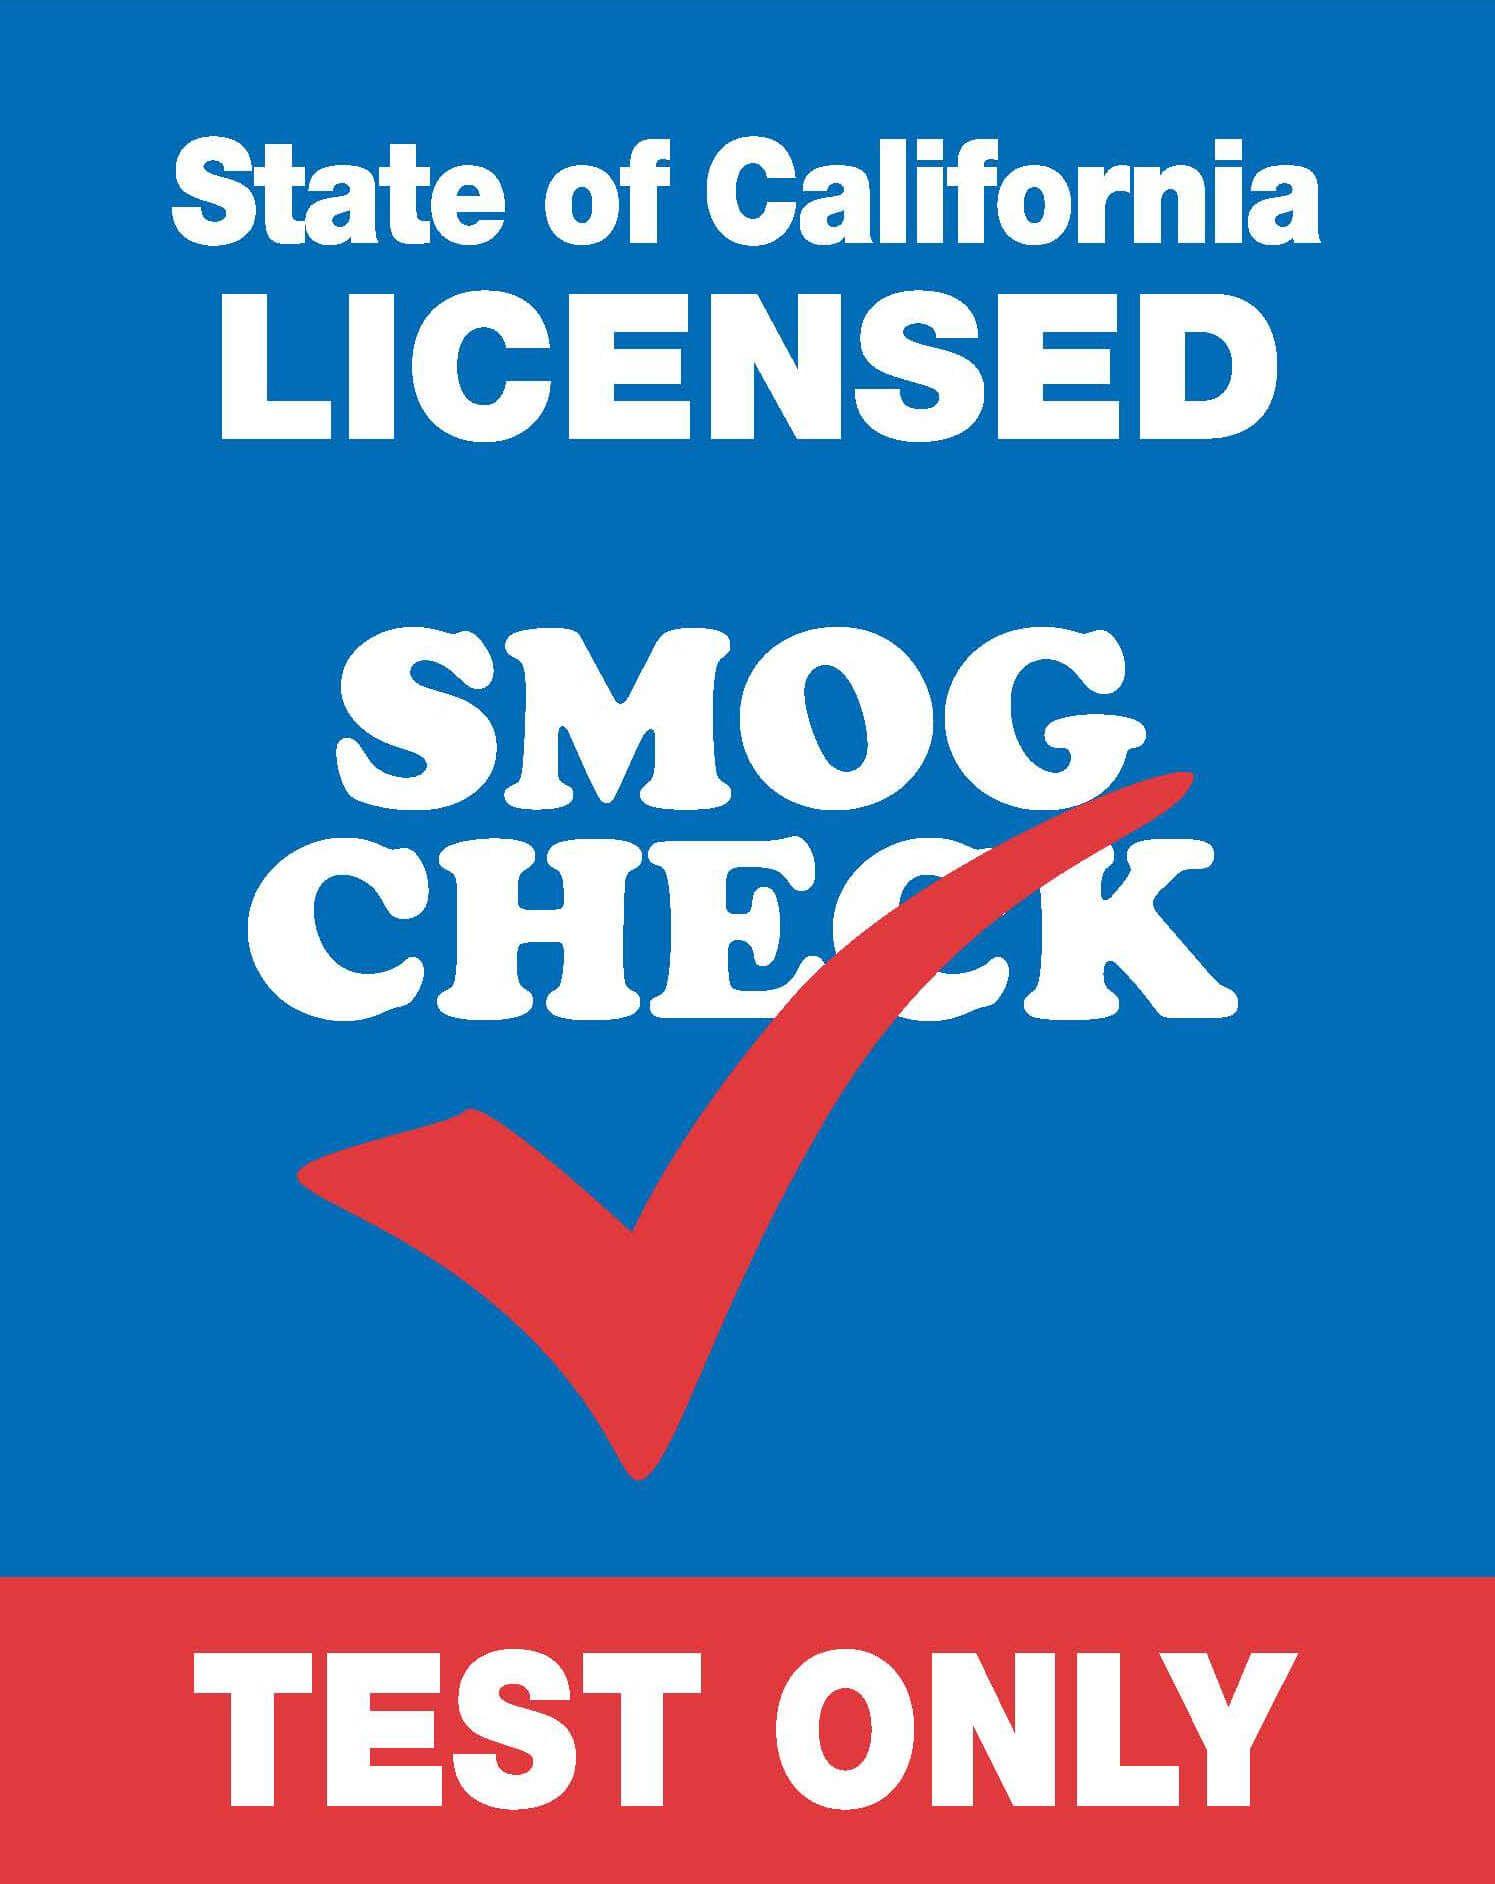 Smog Check License off Douglas...also 20 off coupon, but